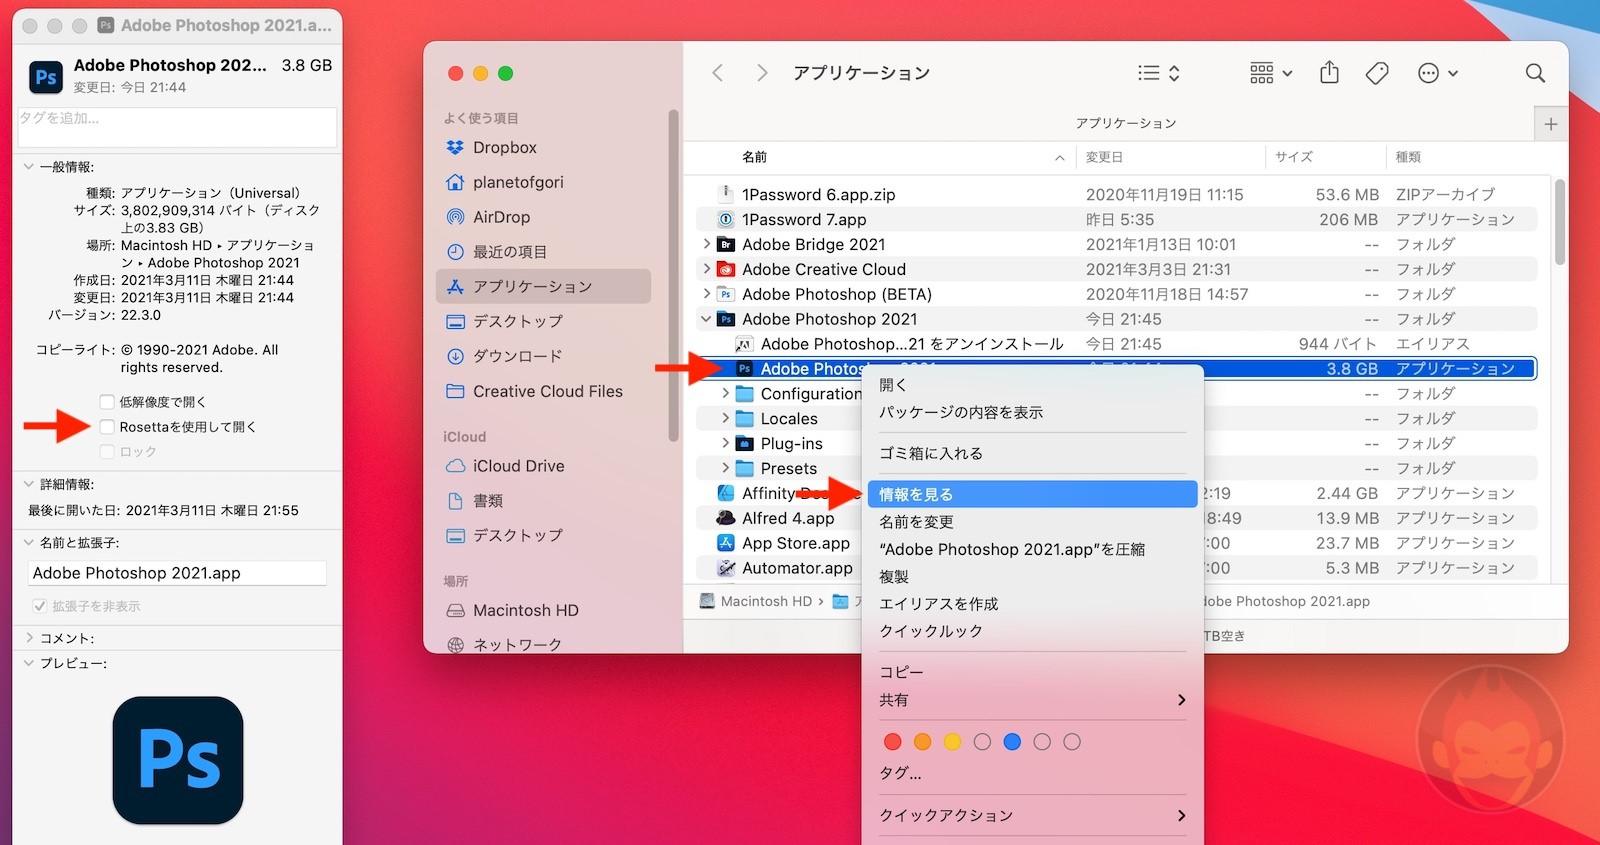 Adobe Photoshop How to run Native or Rosetta 01